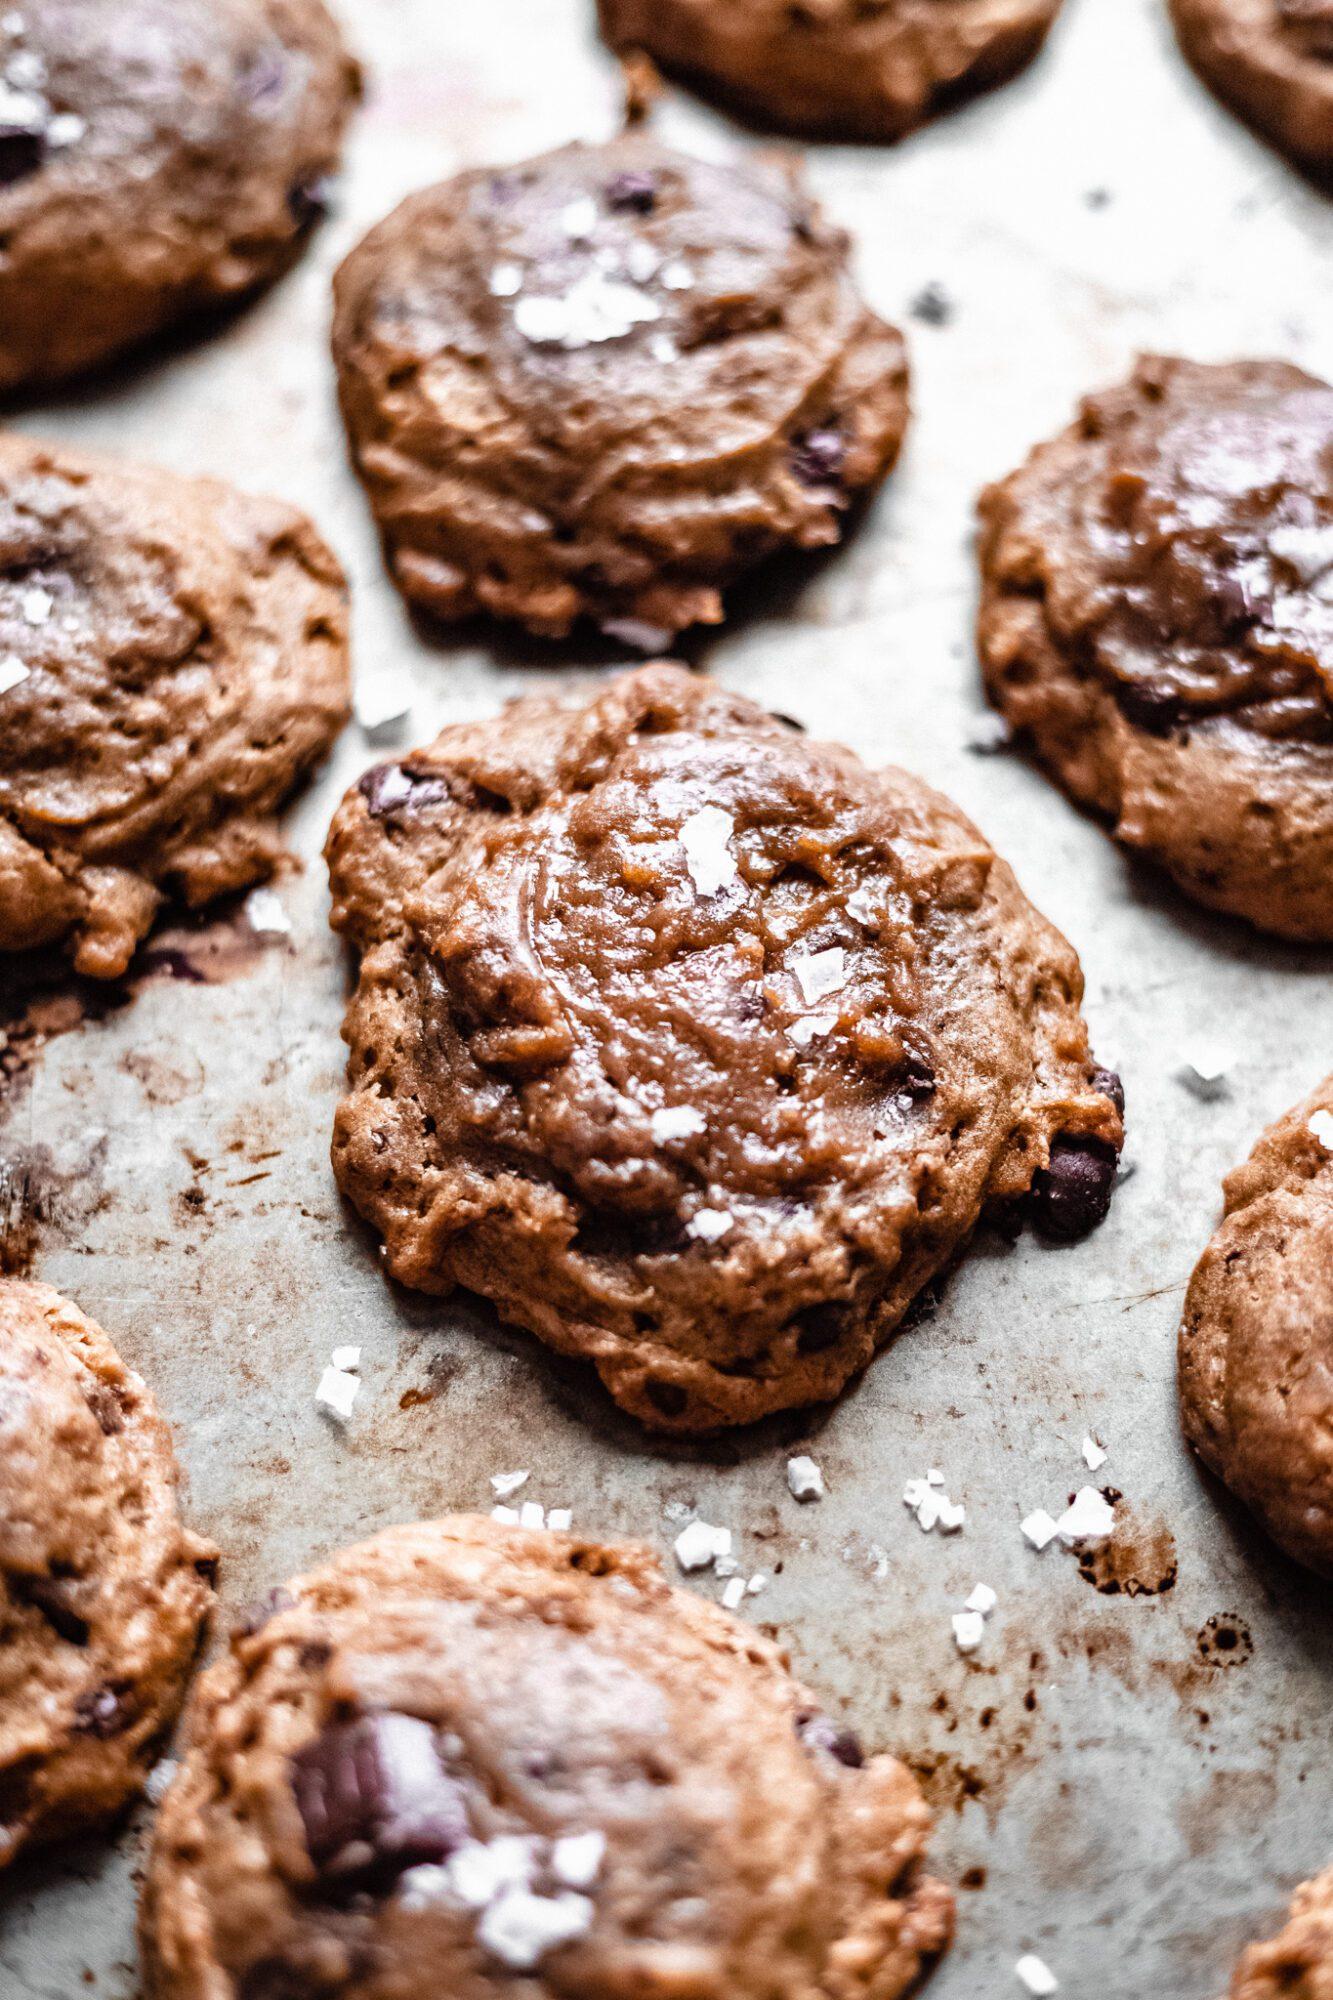 baking vegan chocolate chip cookies